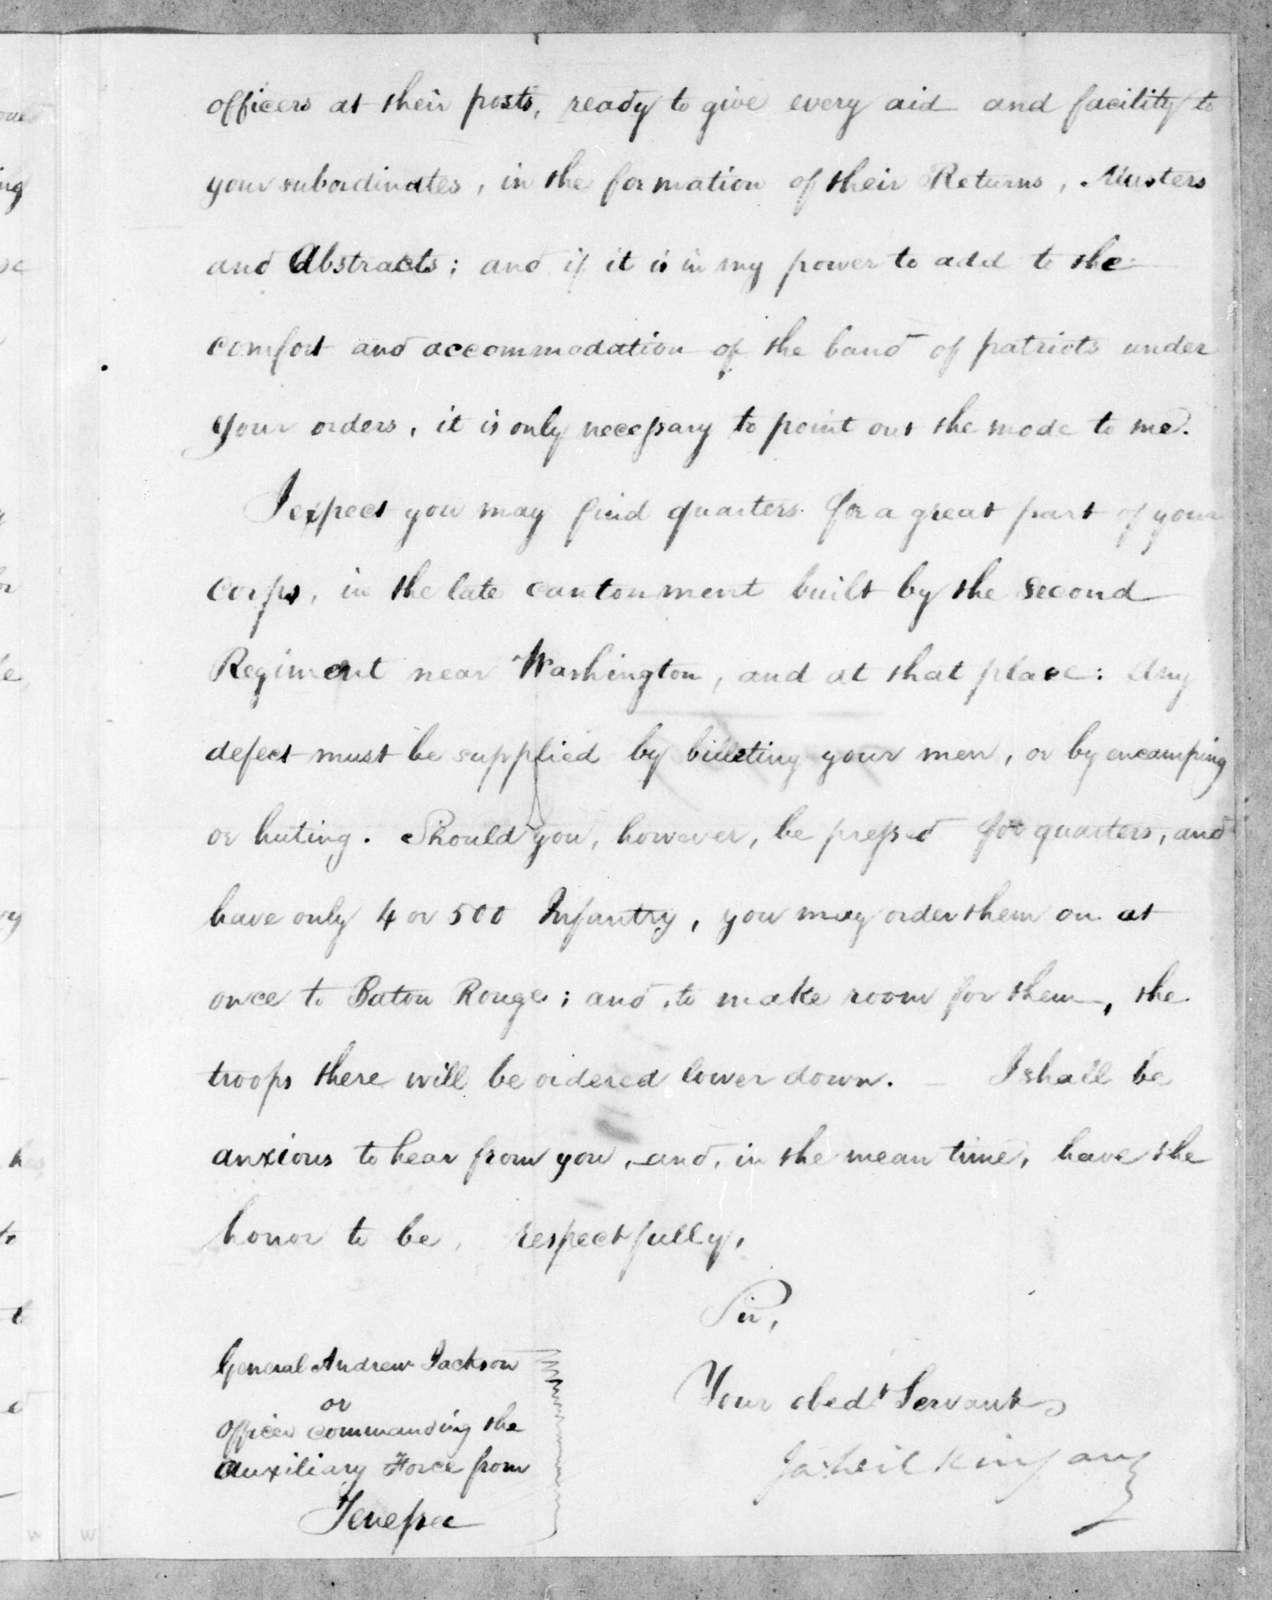 James Wilkinson to Andrew Jackson, January 22, 1813